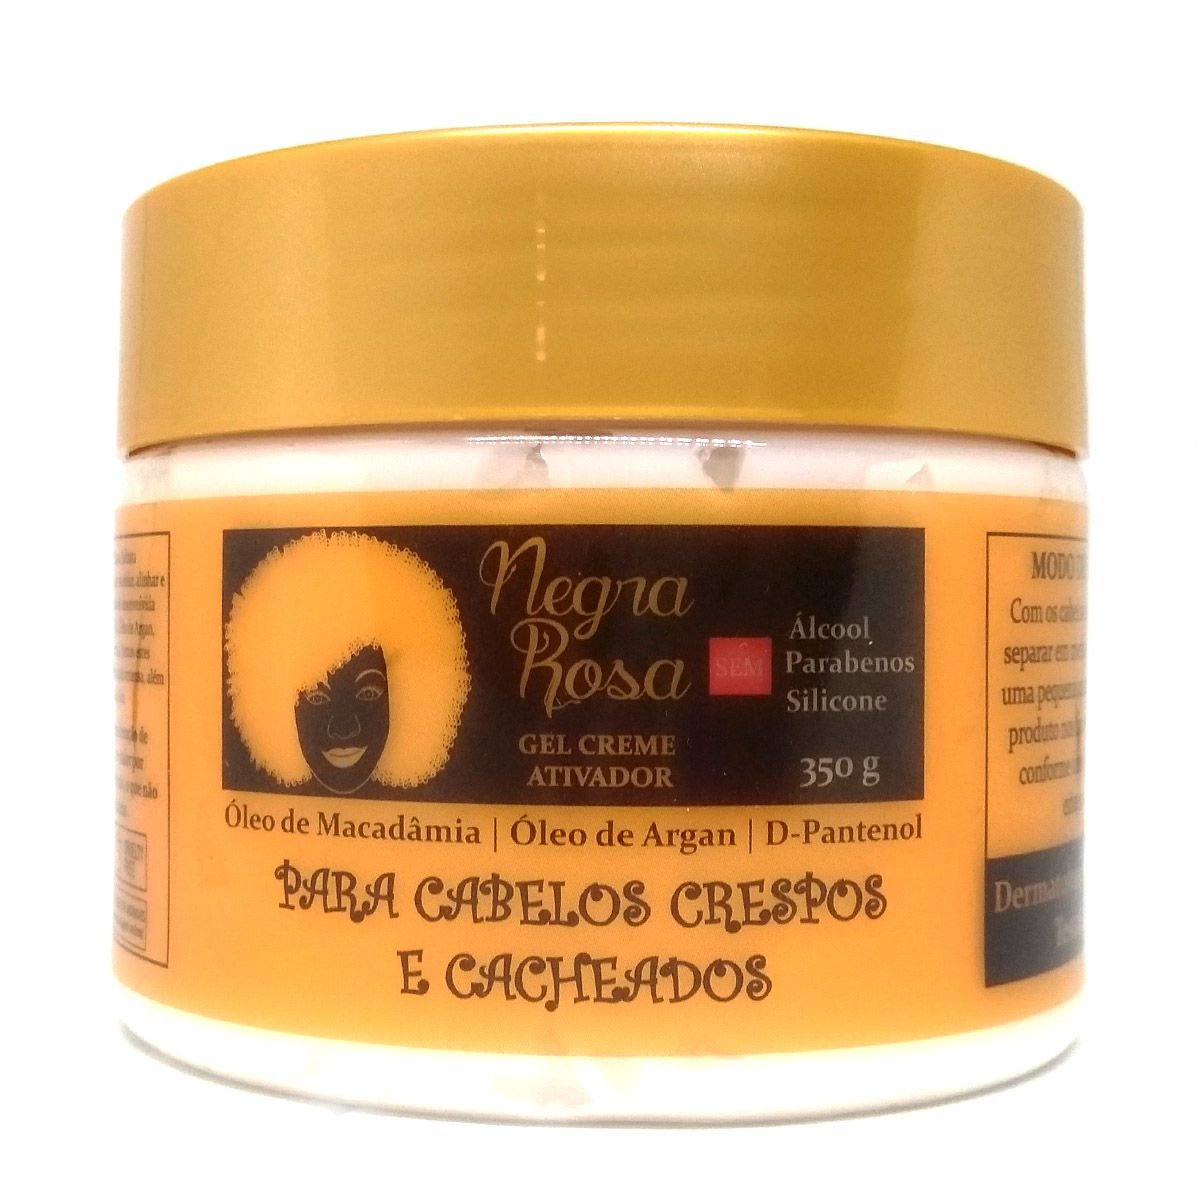 Gel Creme - Negra Rosa - 350g